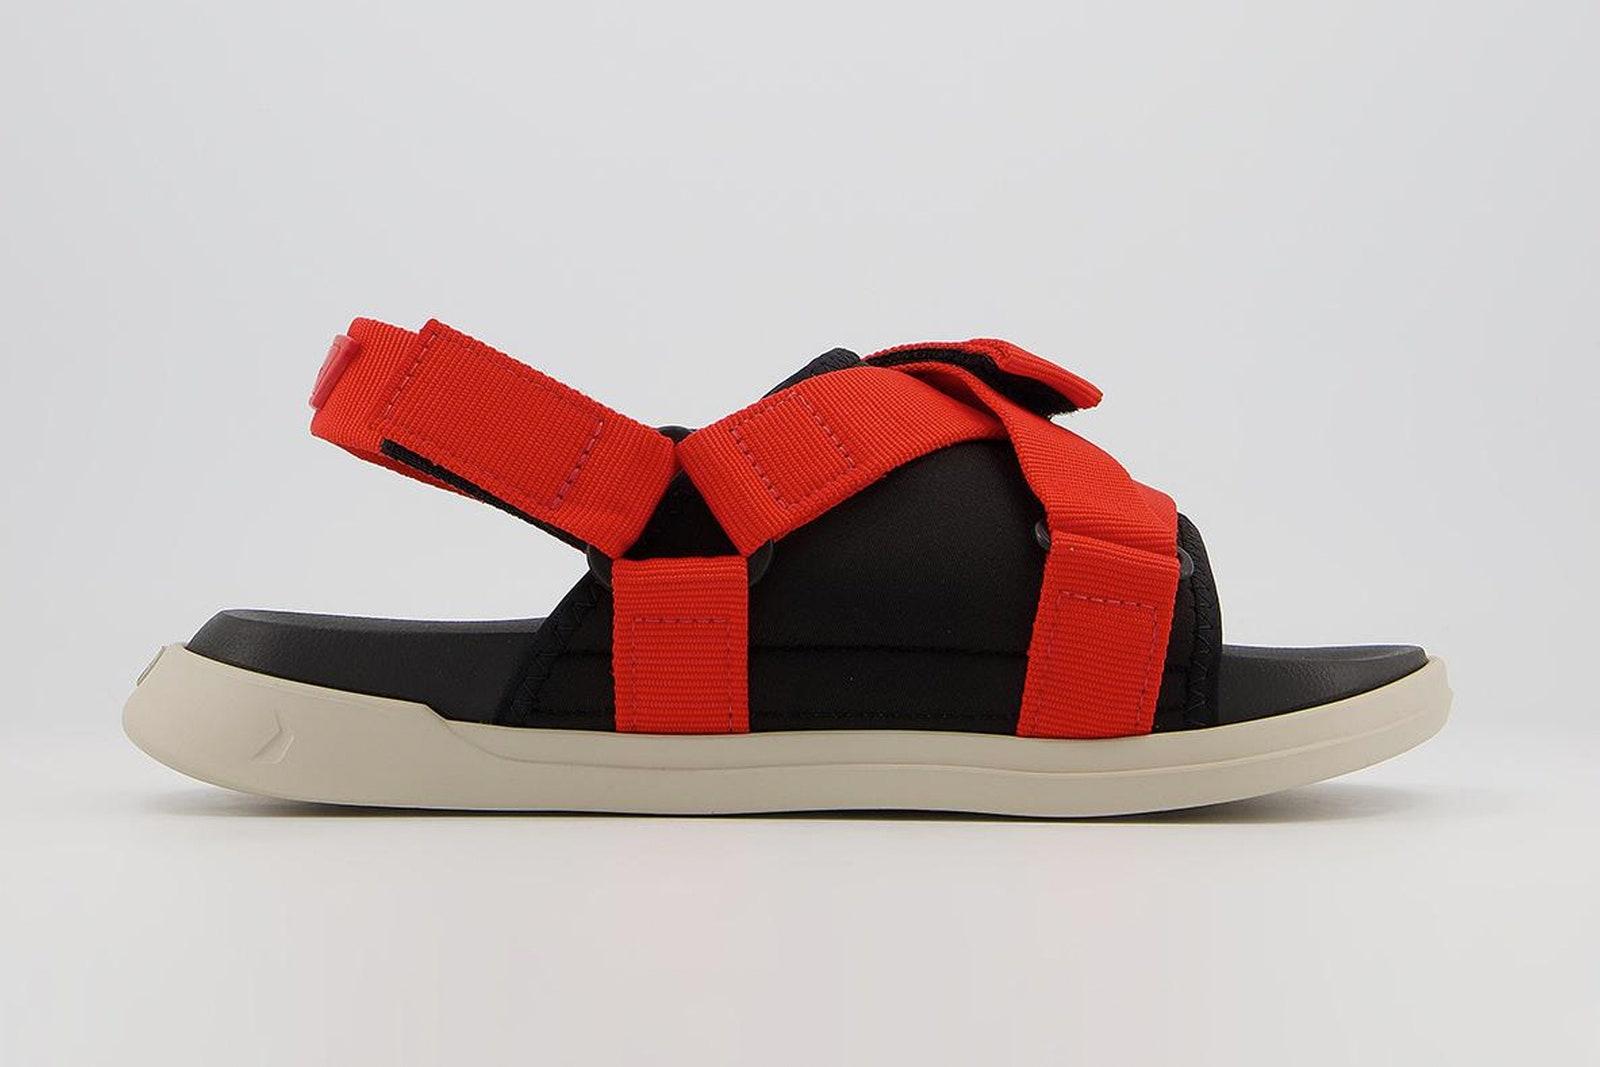 Мужская обувь лета 2021: 8 актуальных сандалий